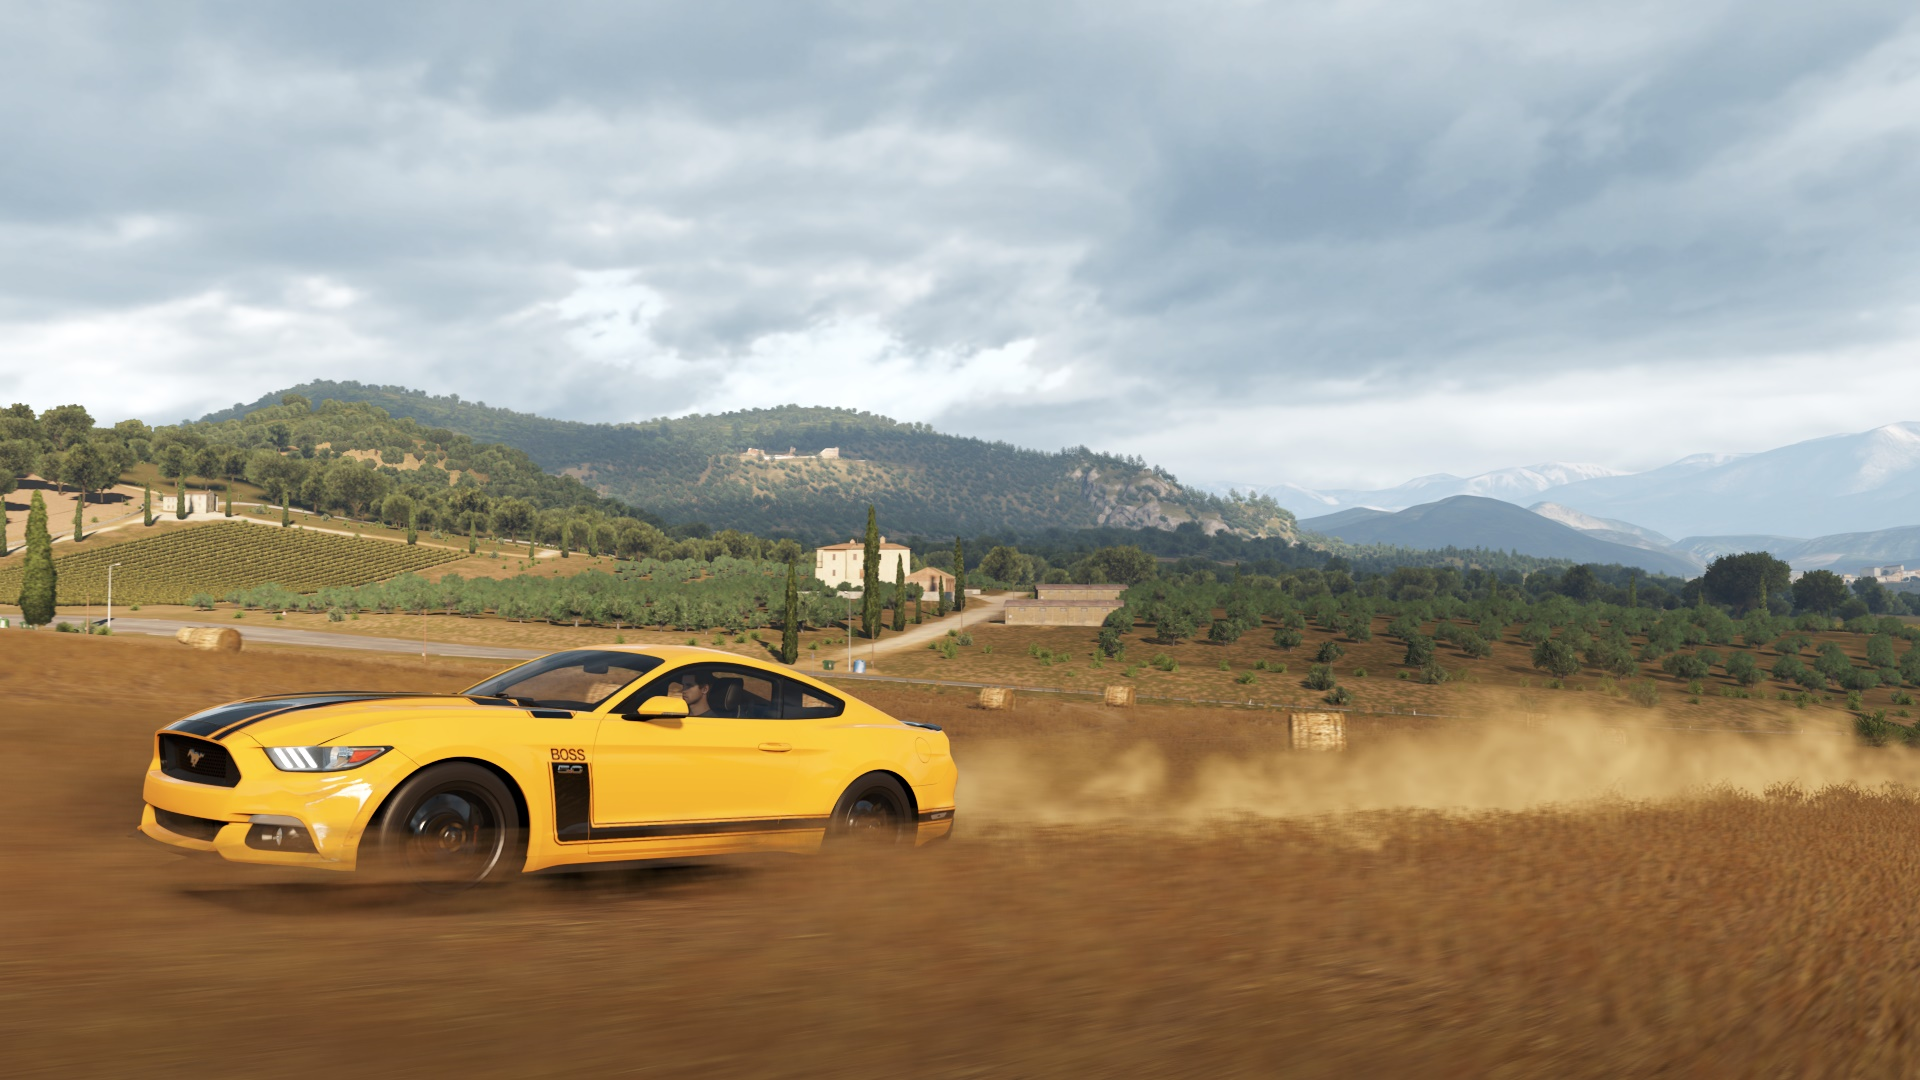 Forza Horizon игра авто загрузить